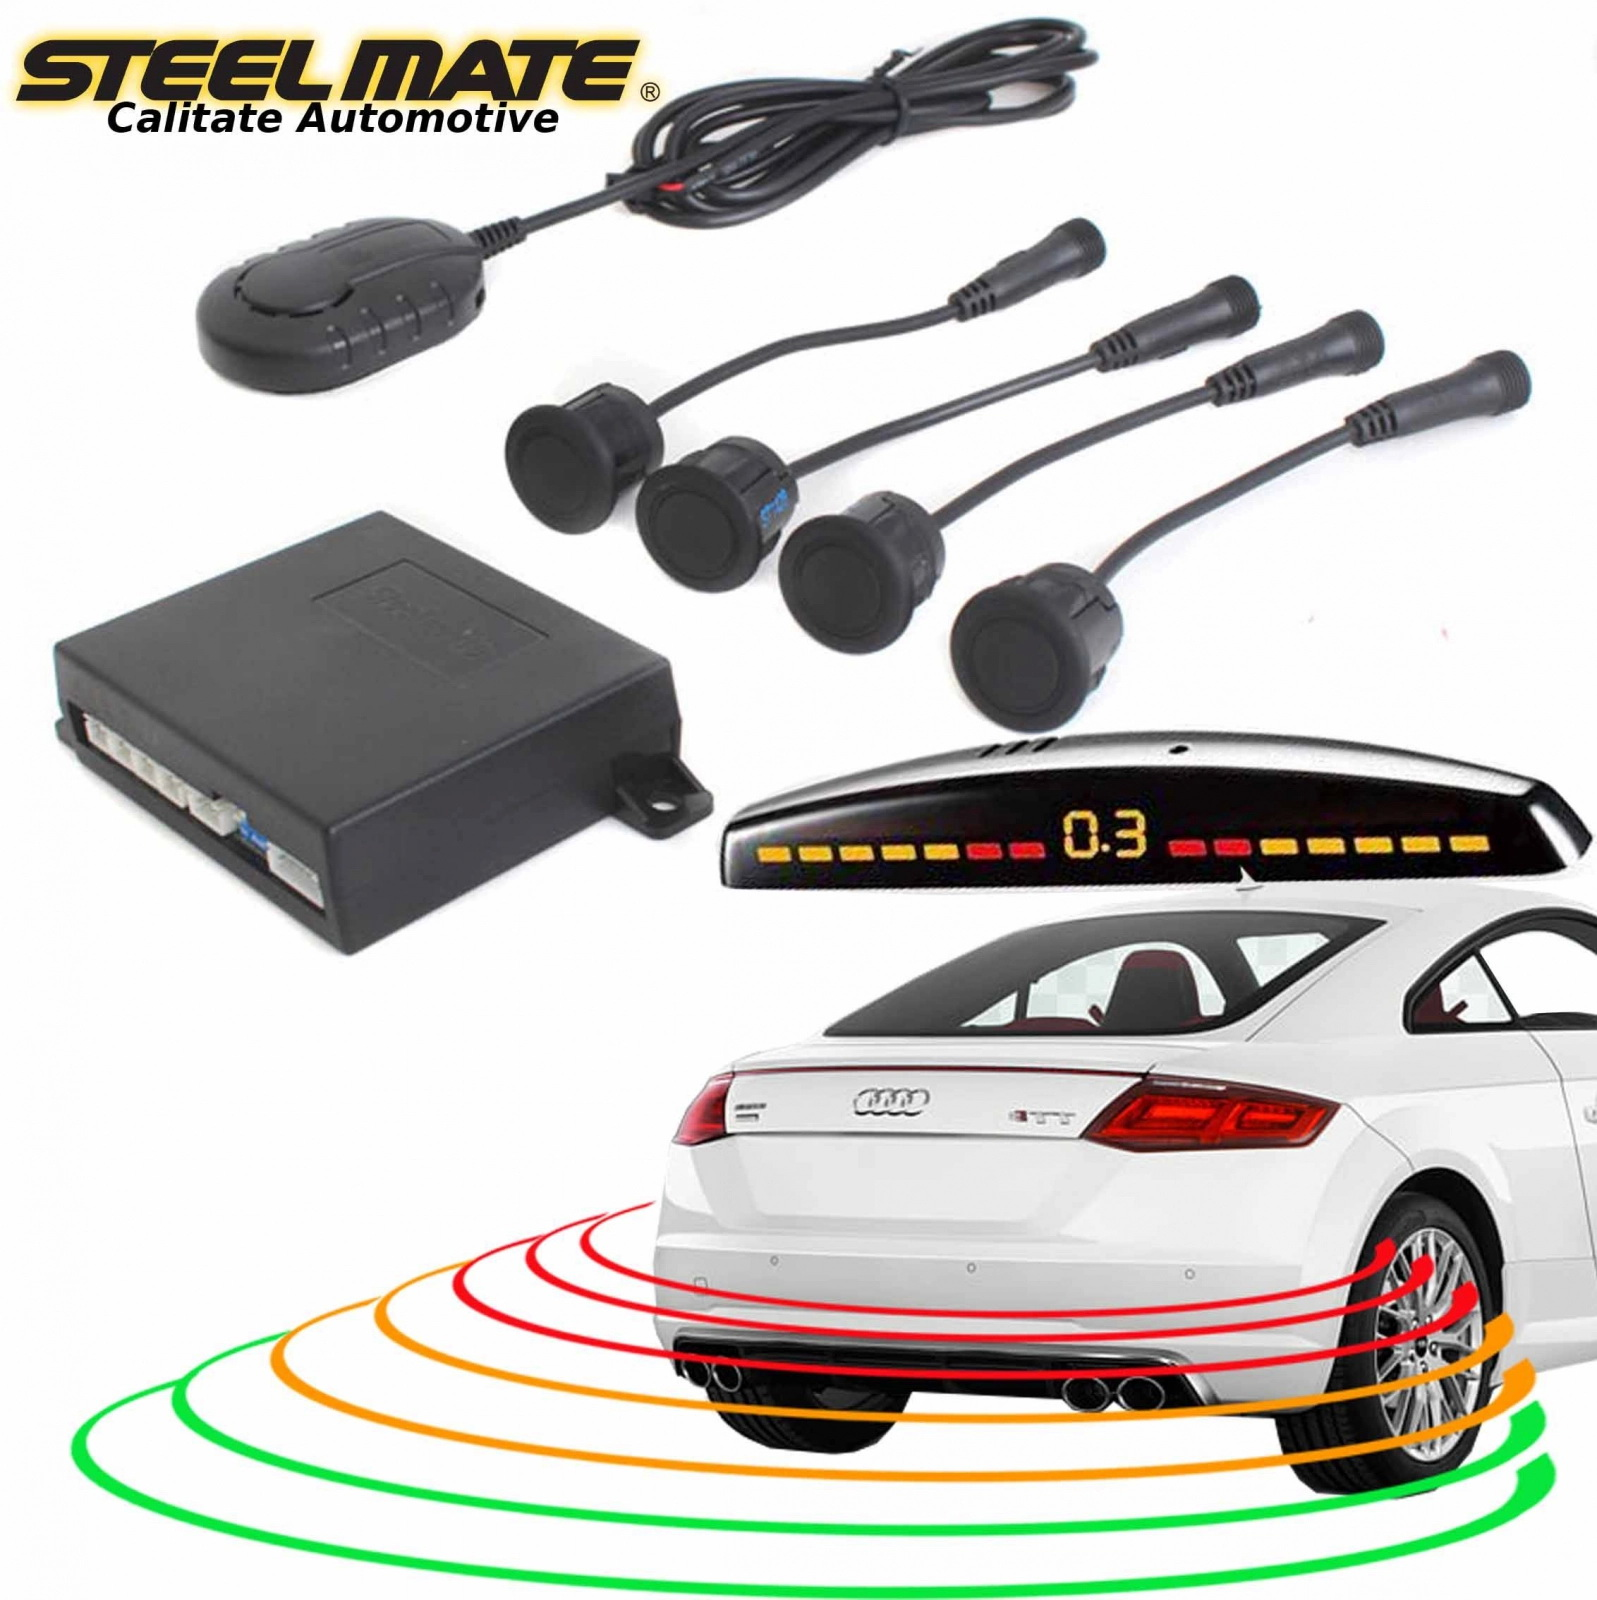 senzori-de-parcare-spate-steelmate-pts410ex-cu-dis-597321-5854-973141